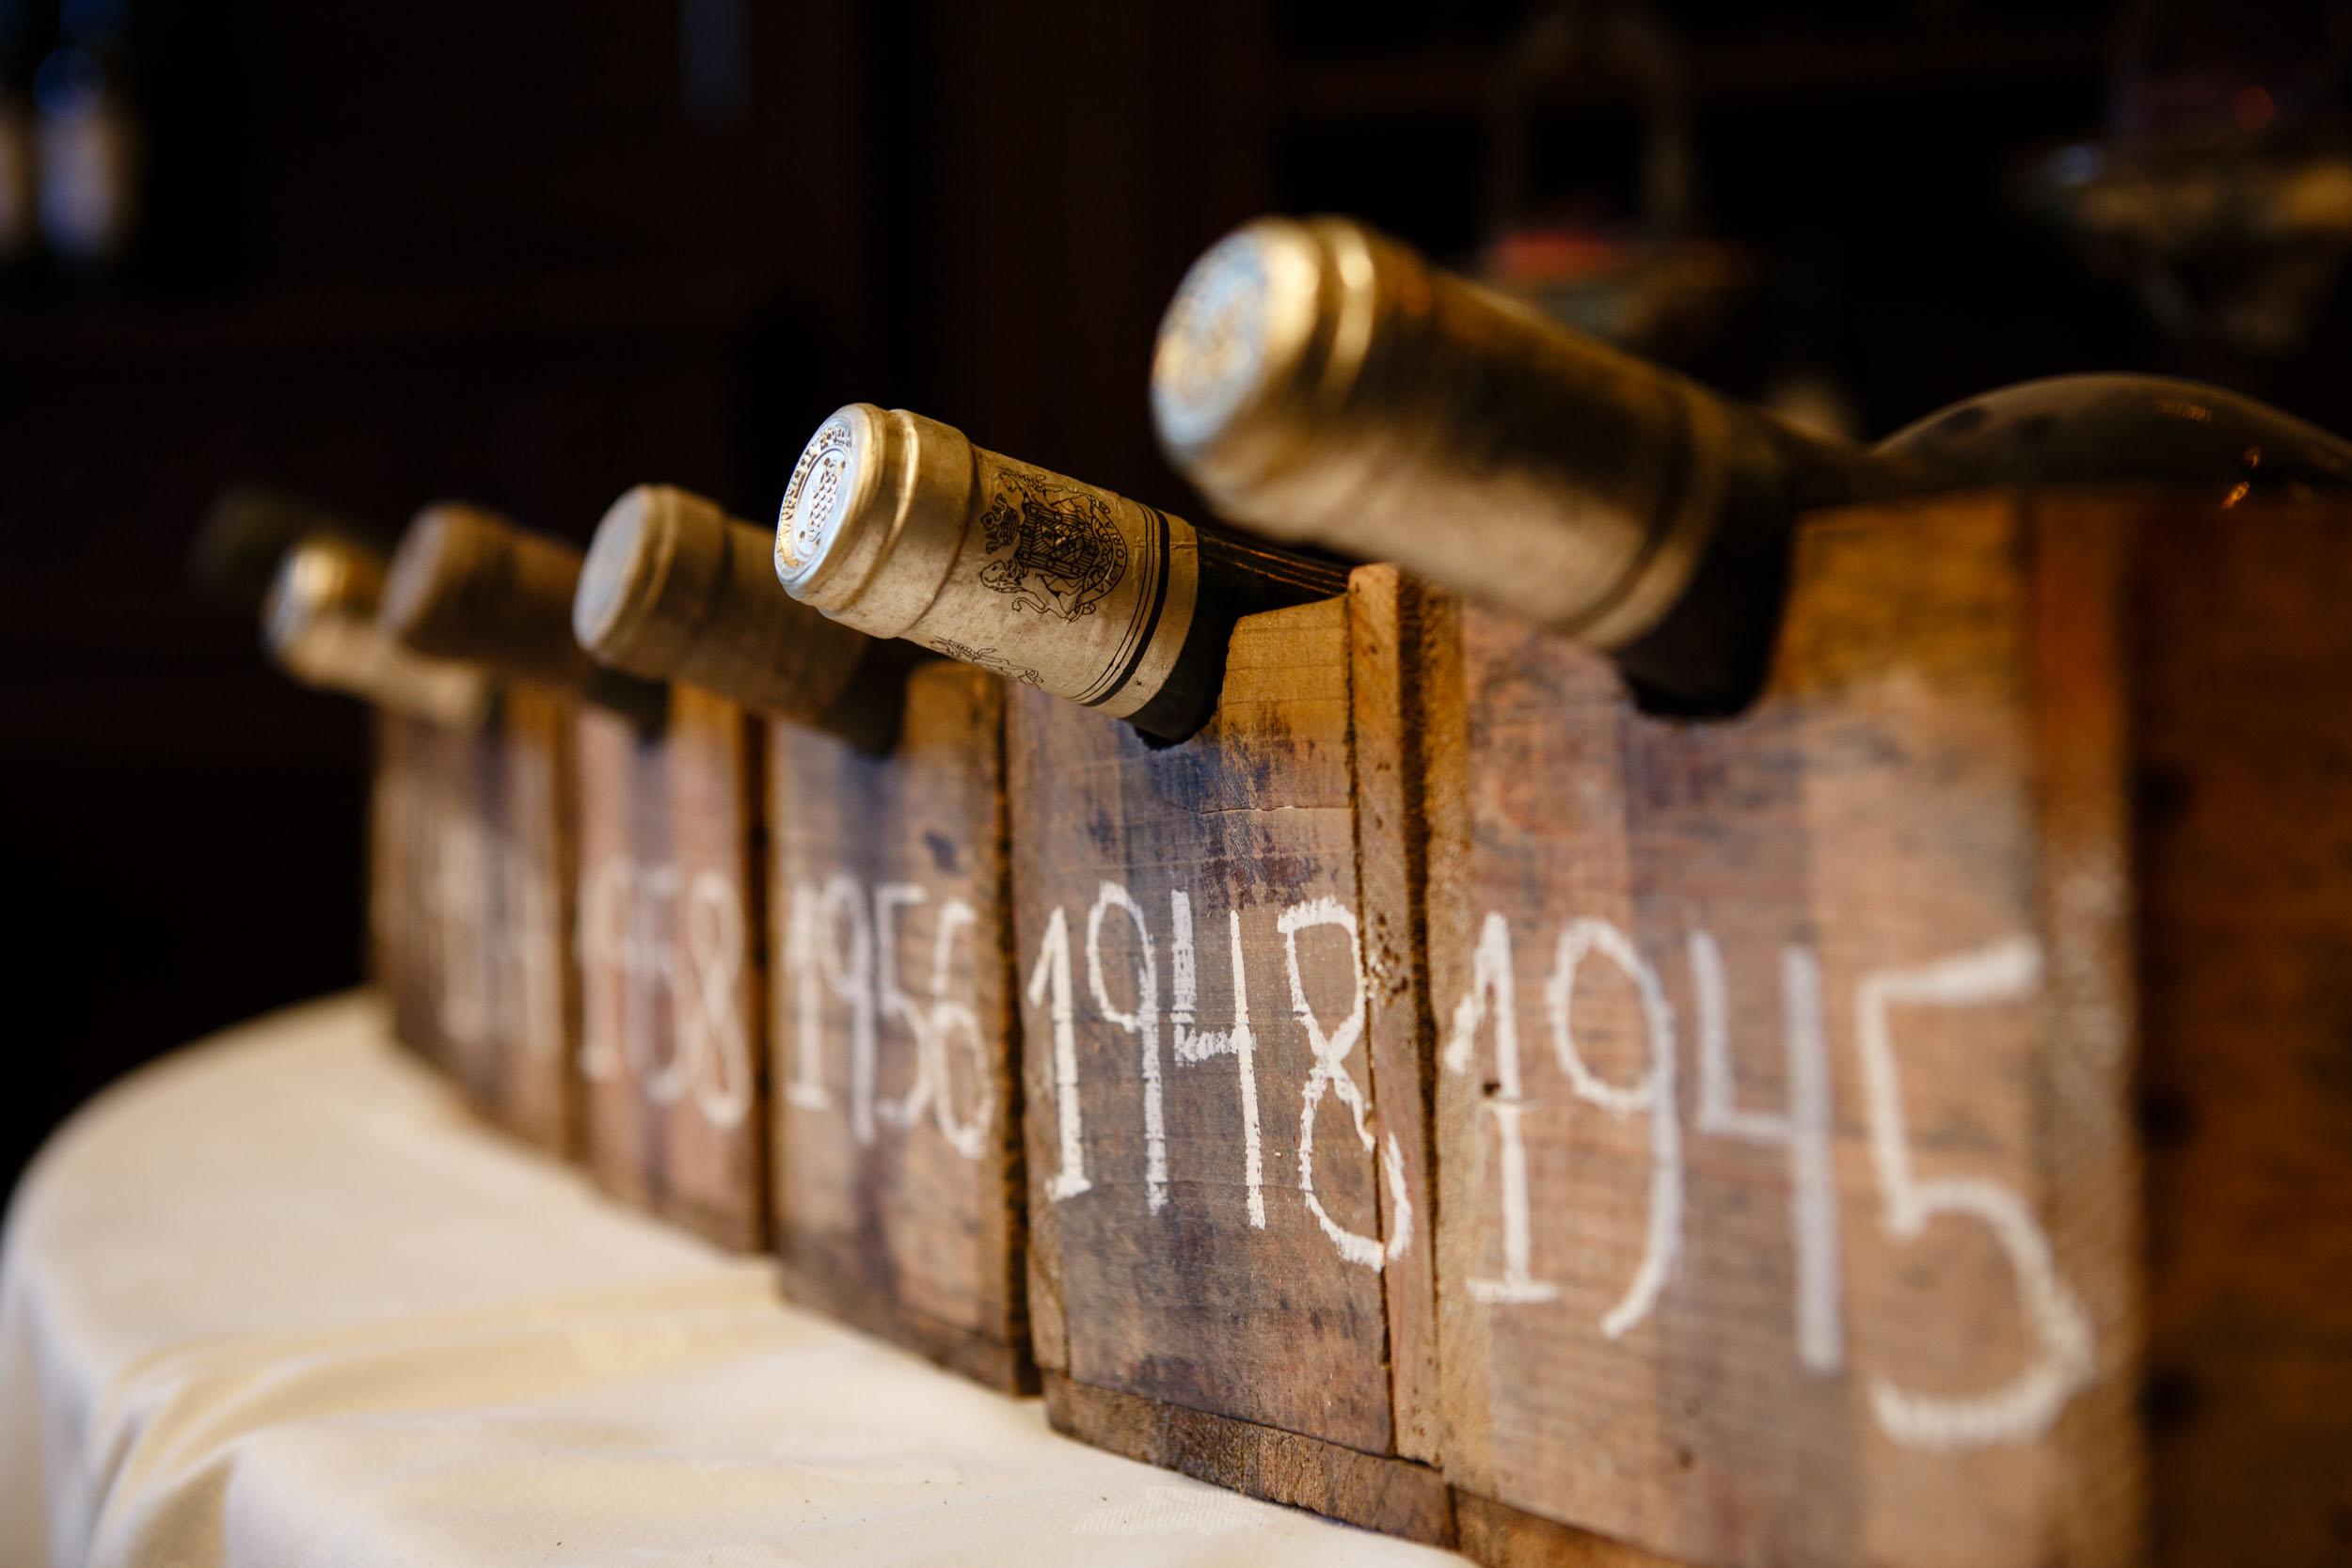 12/11/12 Cata históica, Bodegas Marqués de Riscal, Elciego, Álava, País Vasco. Foto por: James Sturcke Fotografía | www.sturcke.org